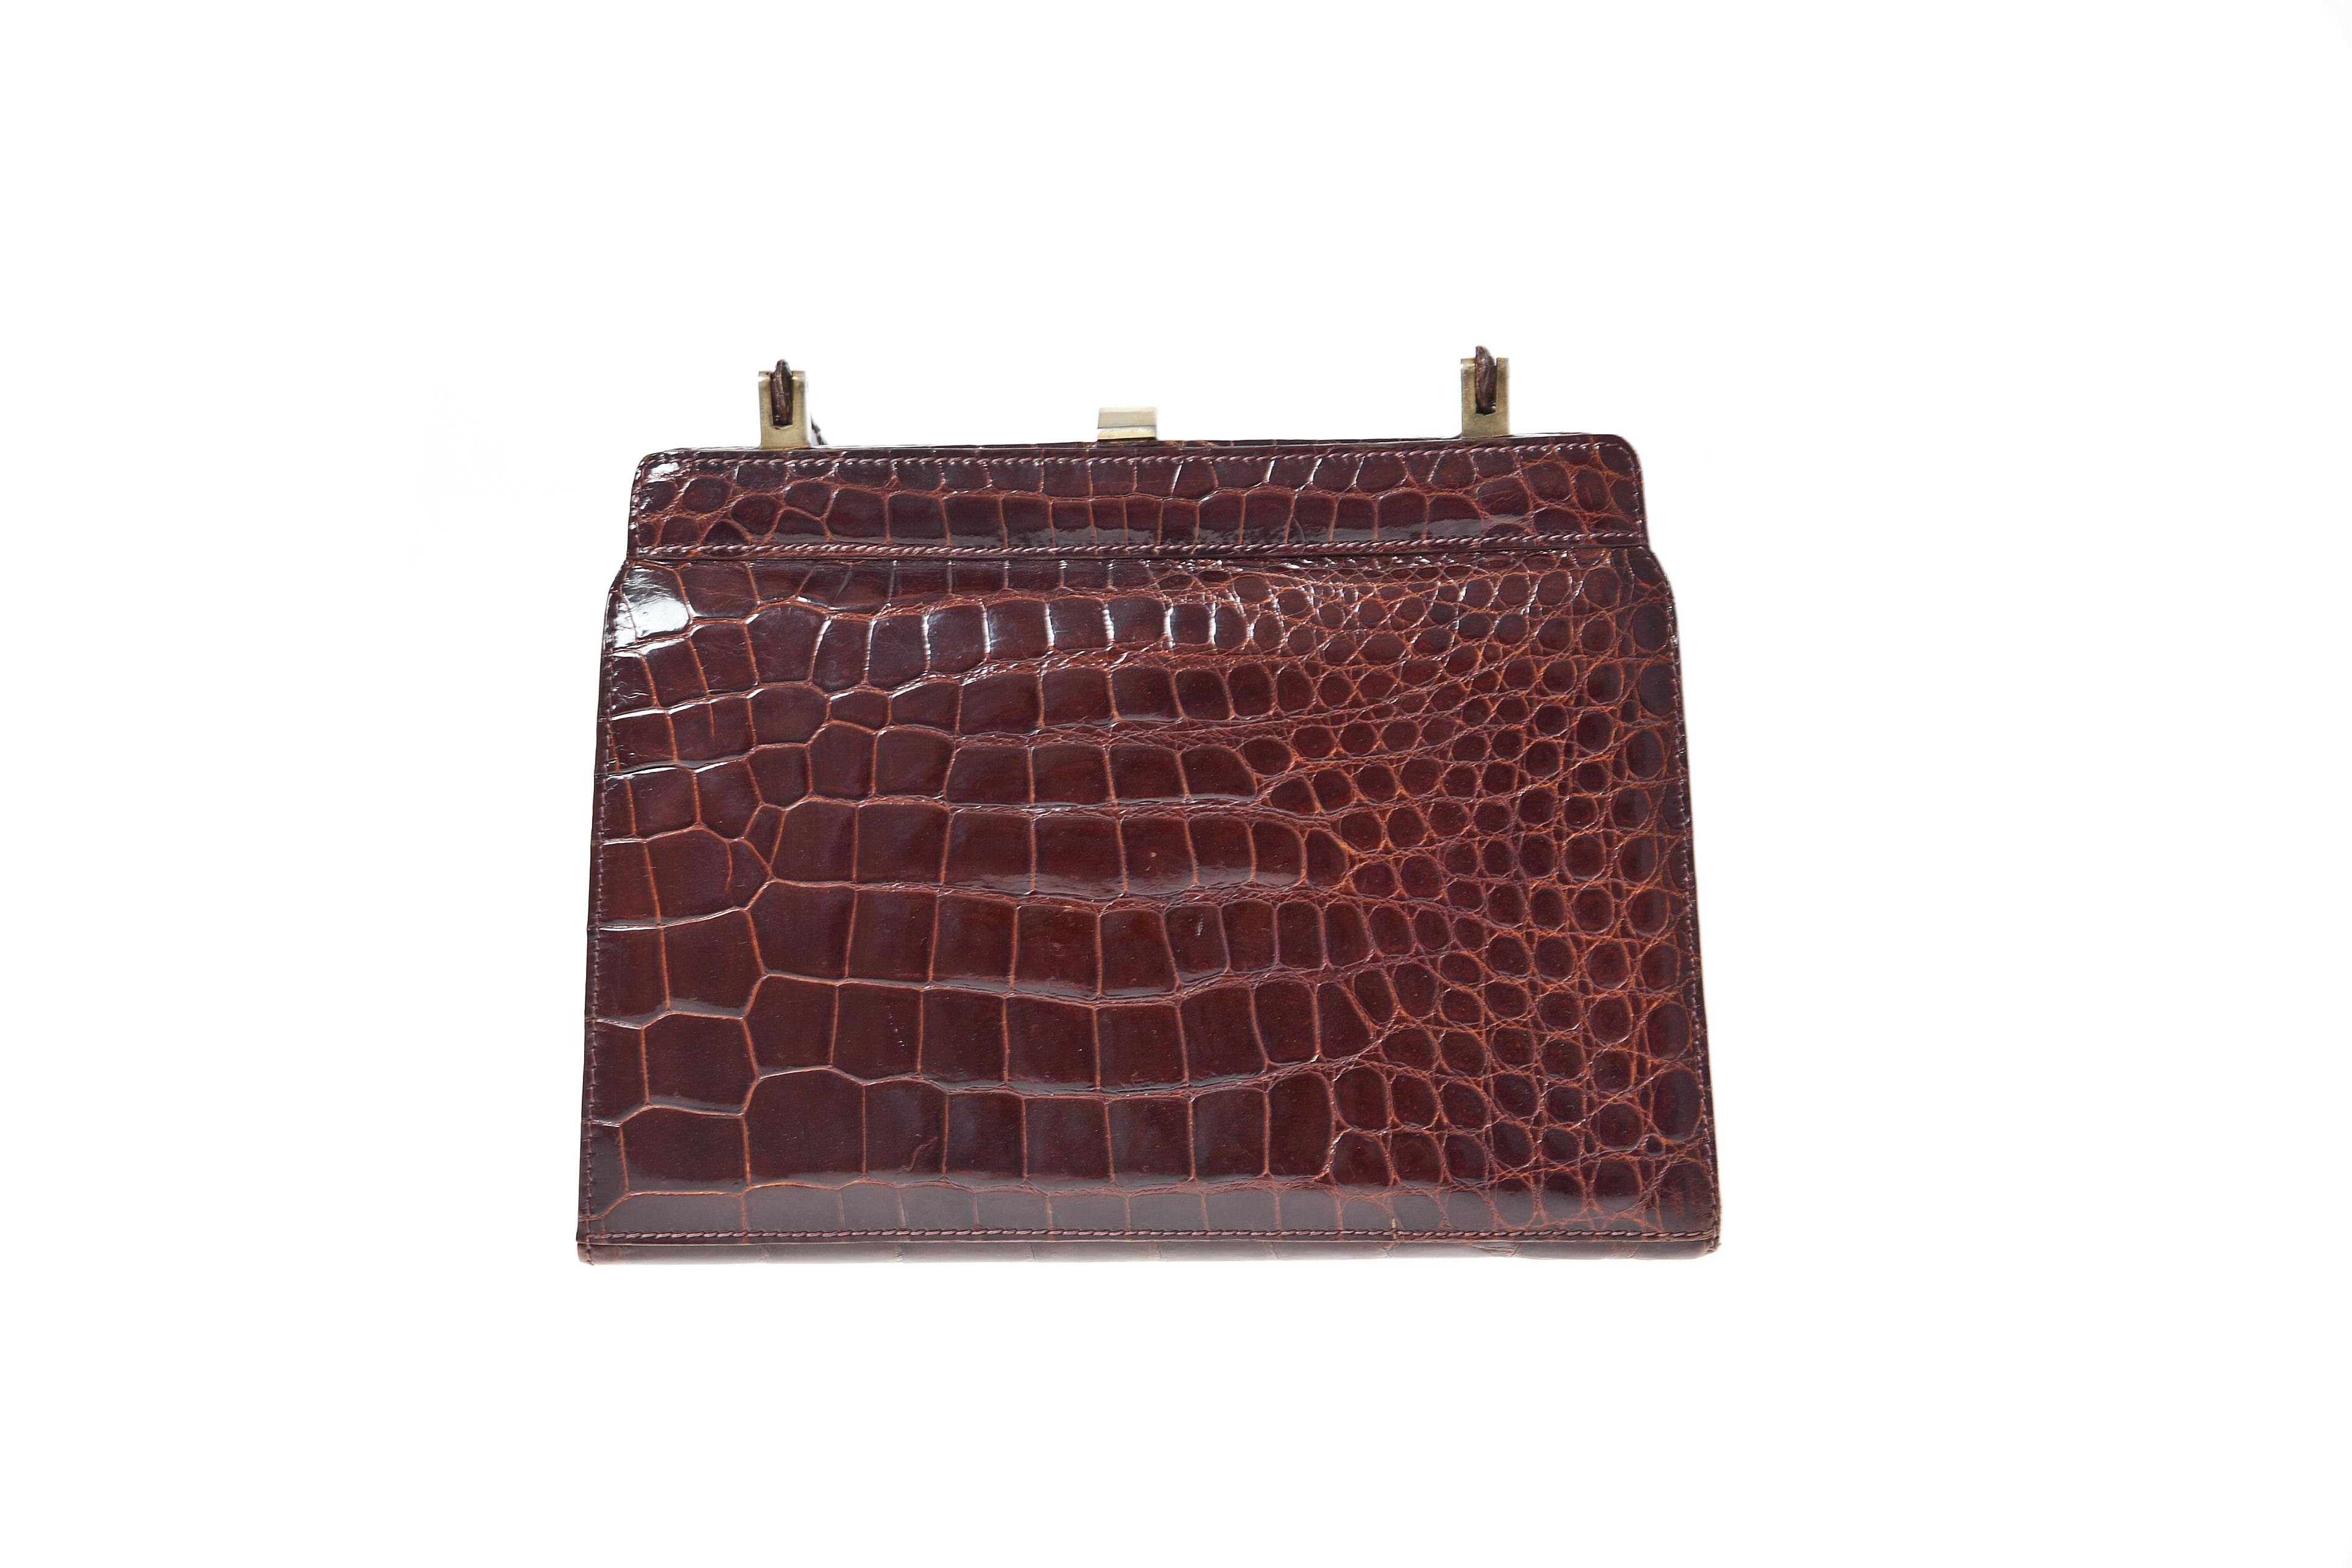 Russel and Bromley brown crocodile handbag